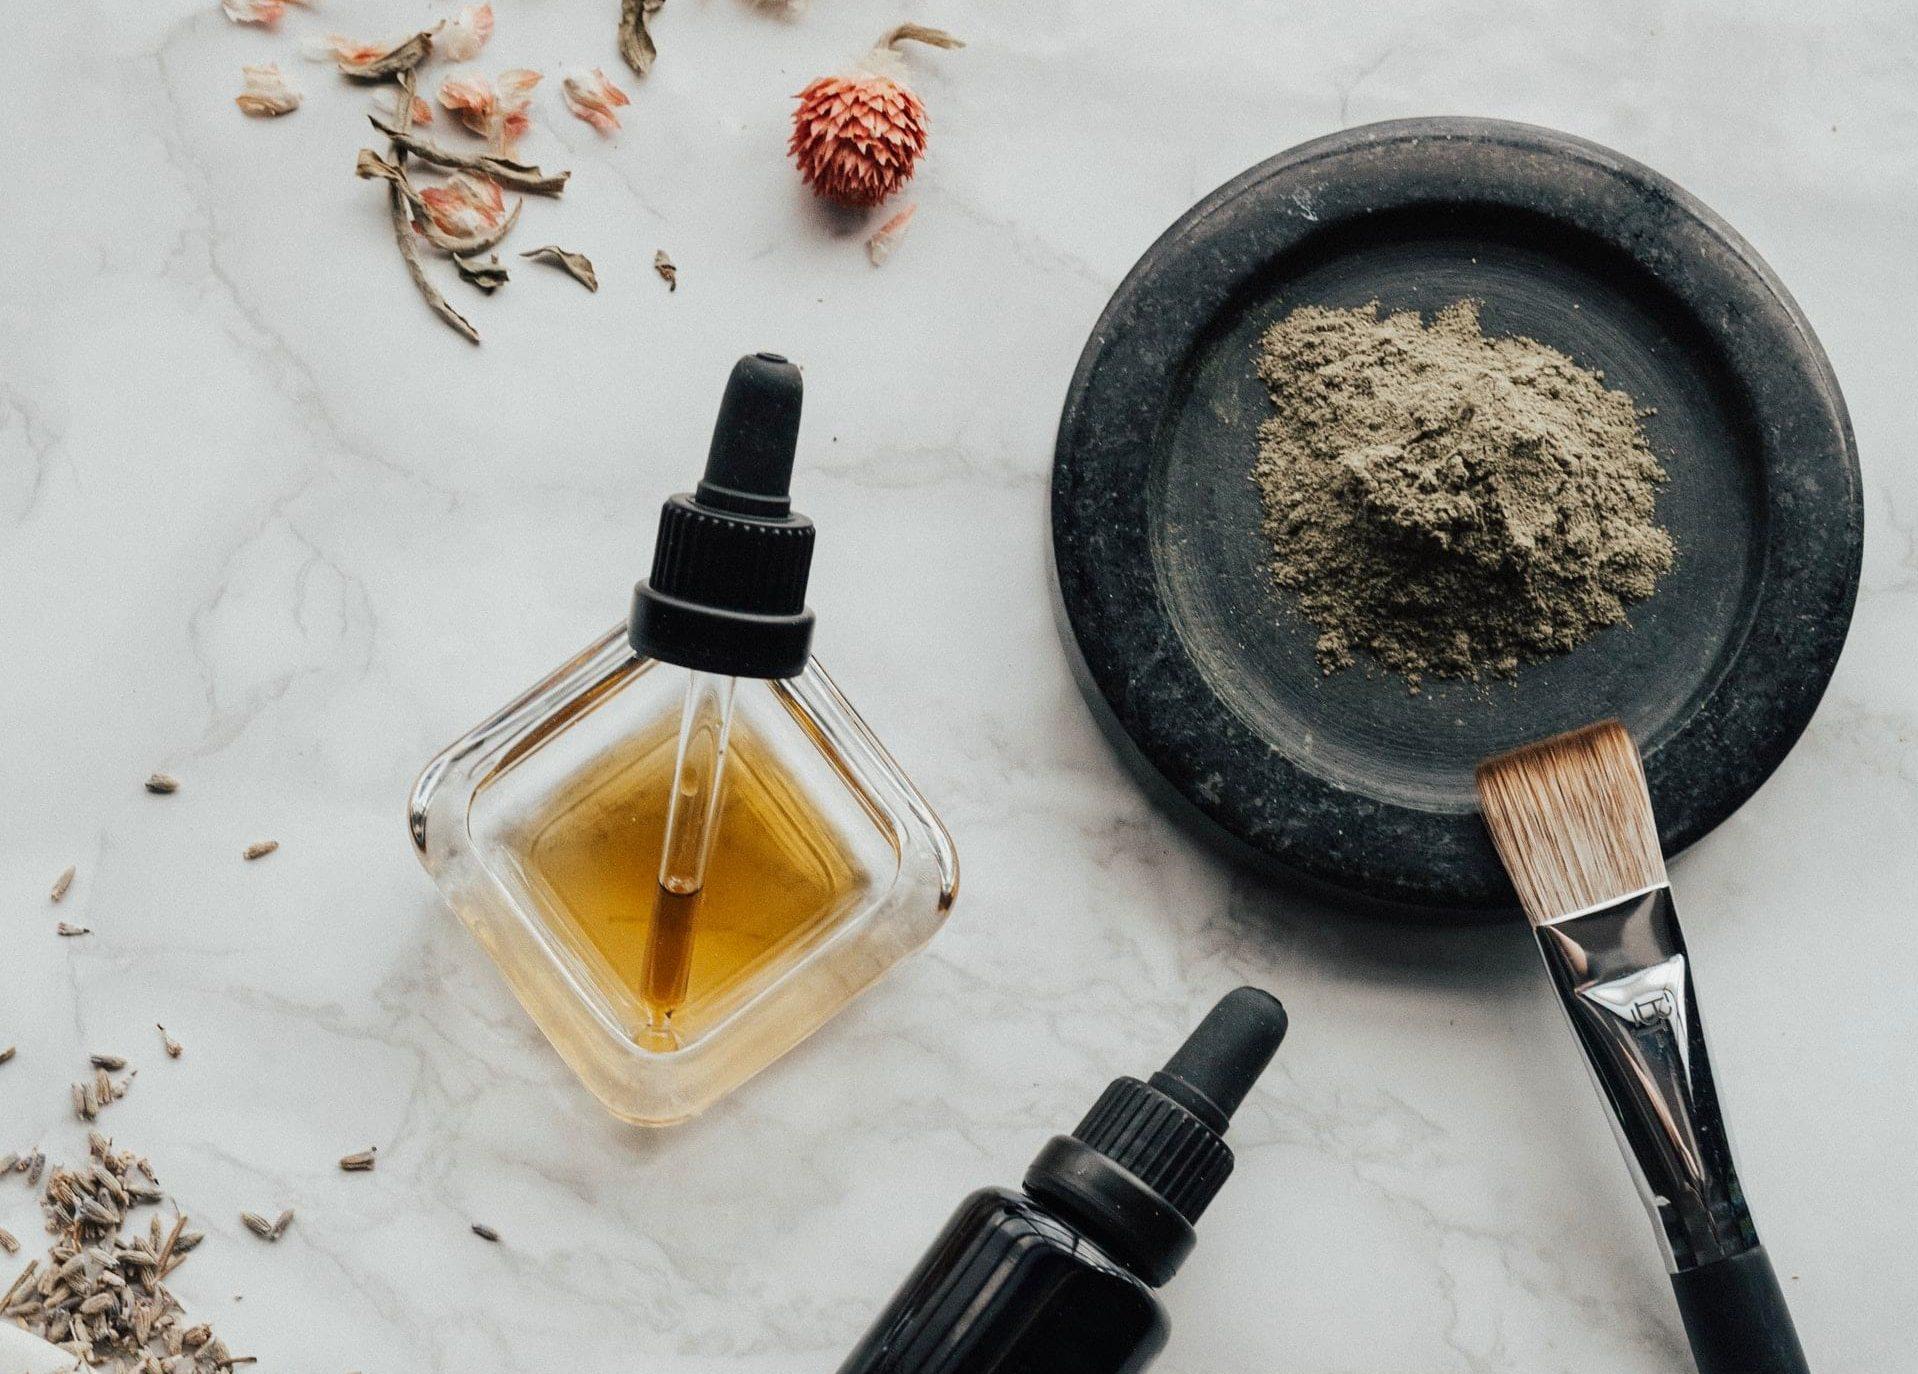 argan oil and cosmetics